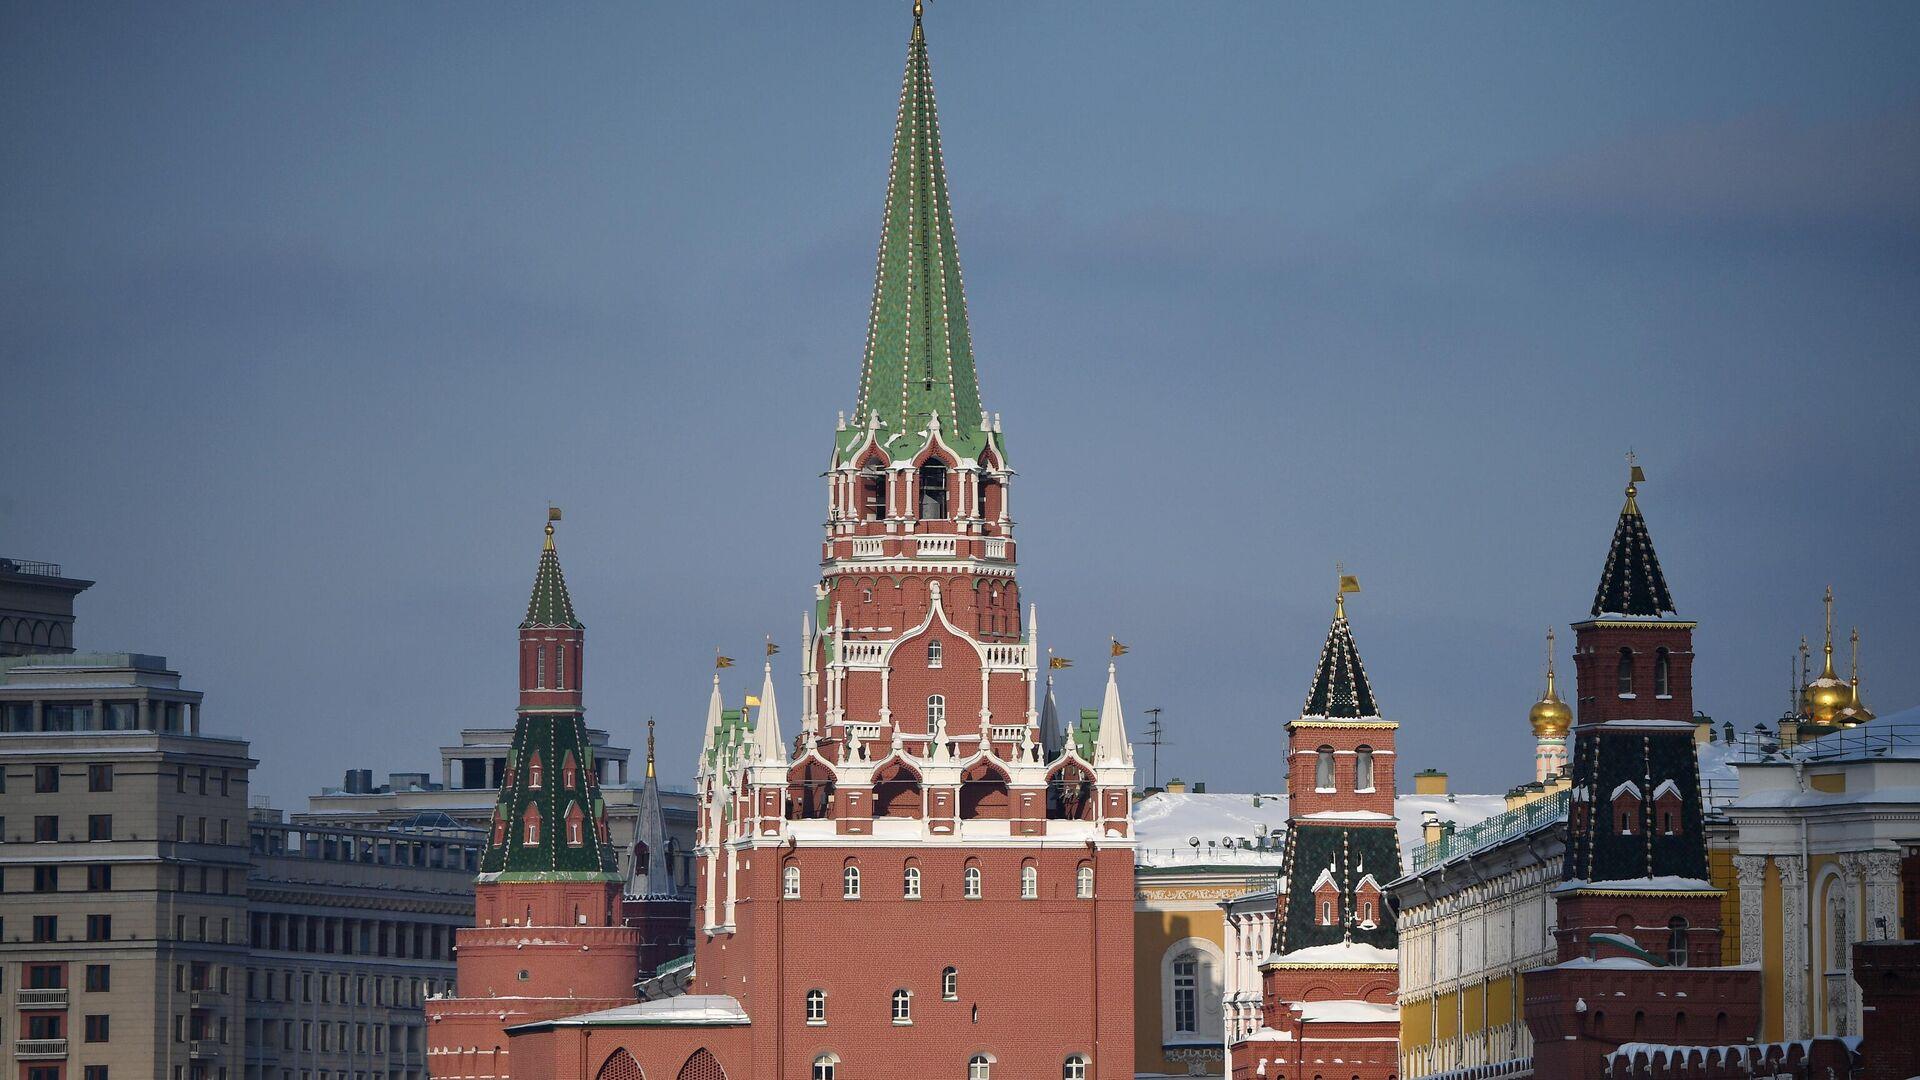 El Kremlin de Moscú, Rusia - Sputnik Mundo, 1920, 16.03.2021